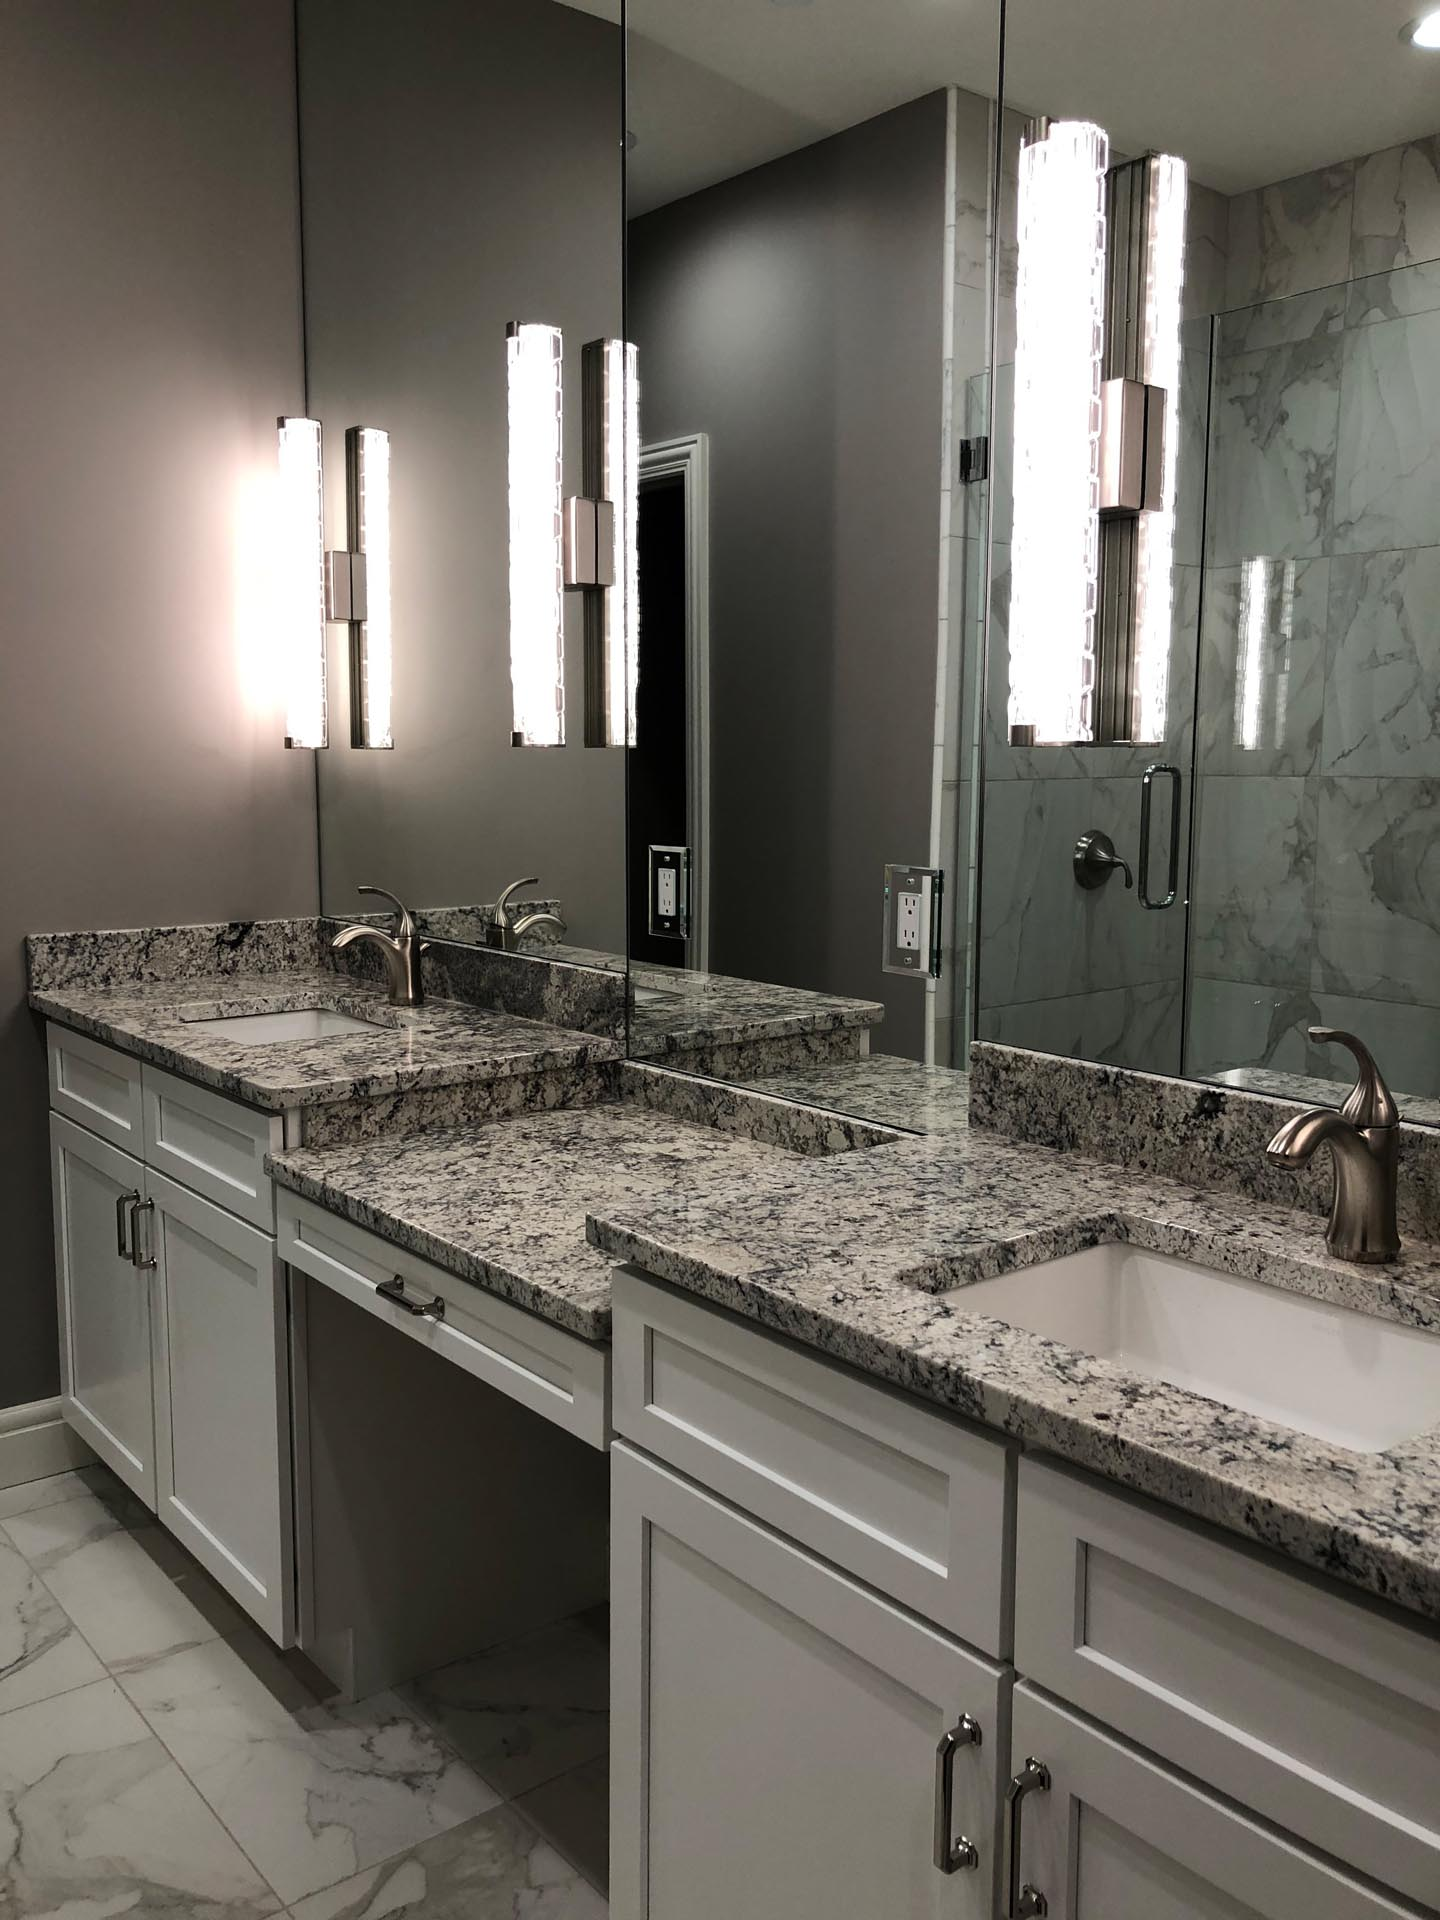 Bathroom Counter Design | H Residence | Midland, MI